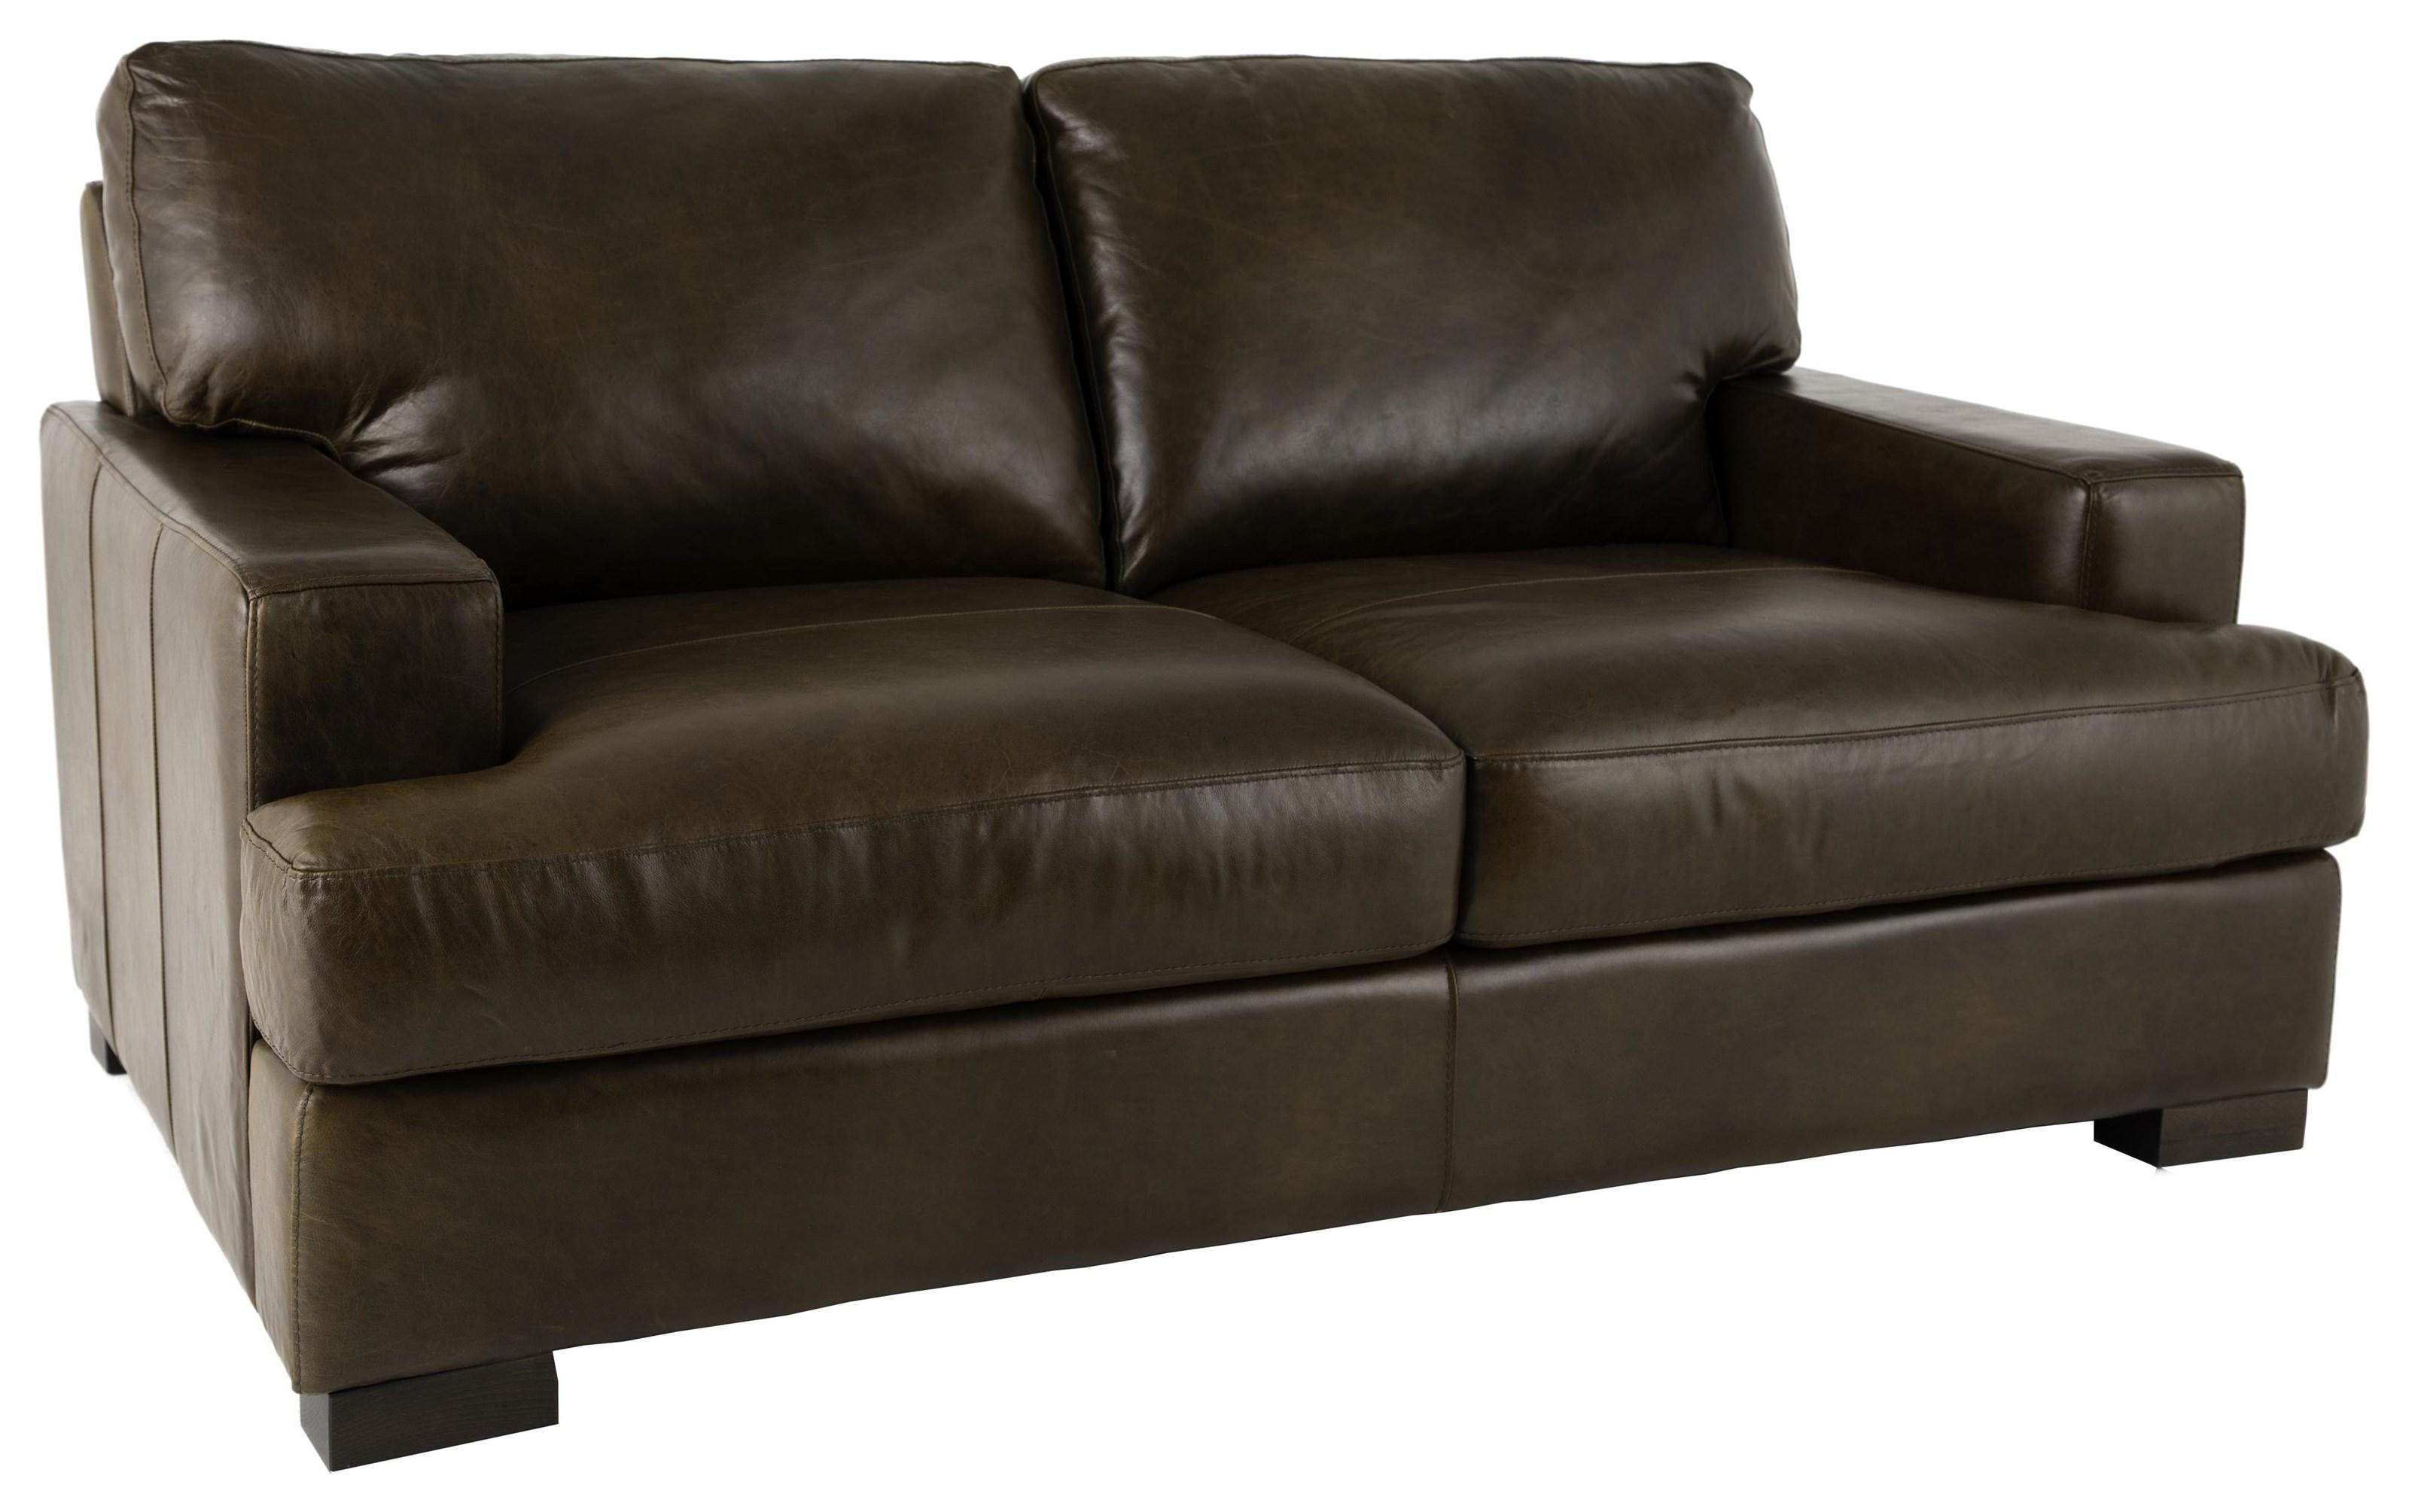 Giorgio Full Italian Leather Loveseat by Delfino at Walker's Furniture